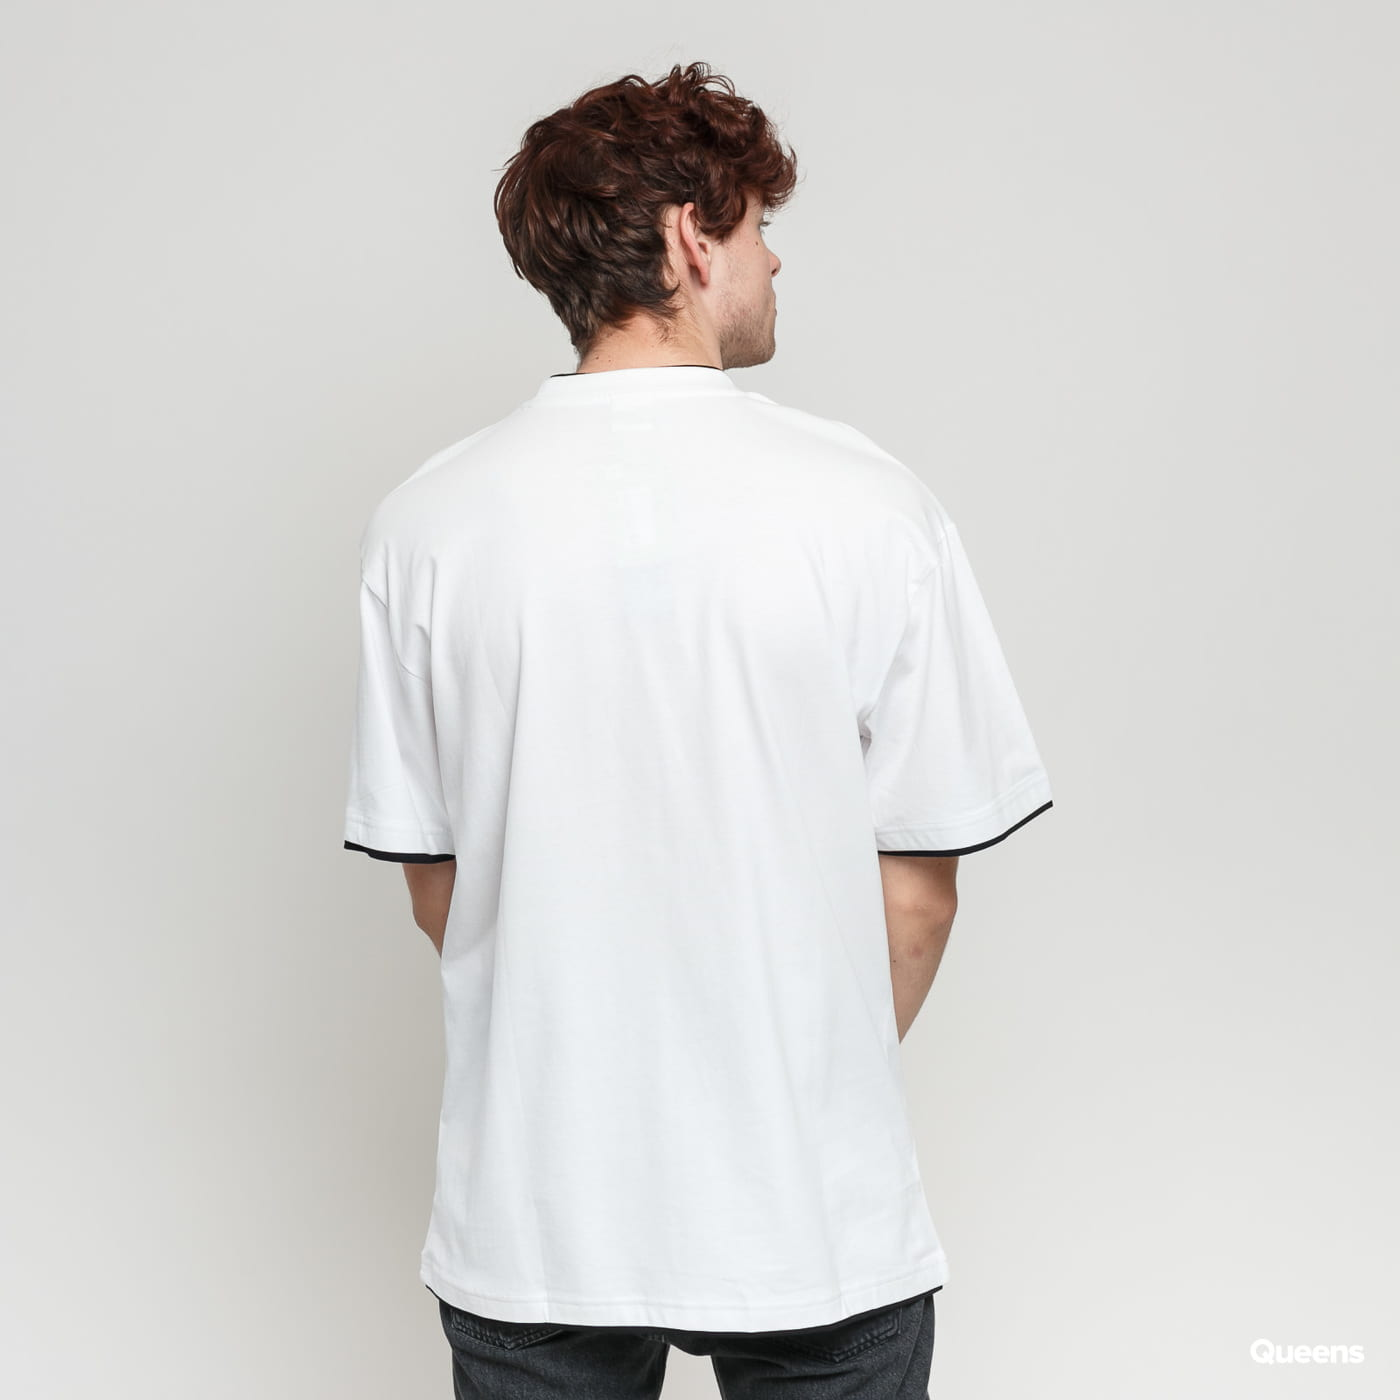 Urban Classics Contrast Tall Tee white / black